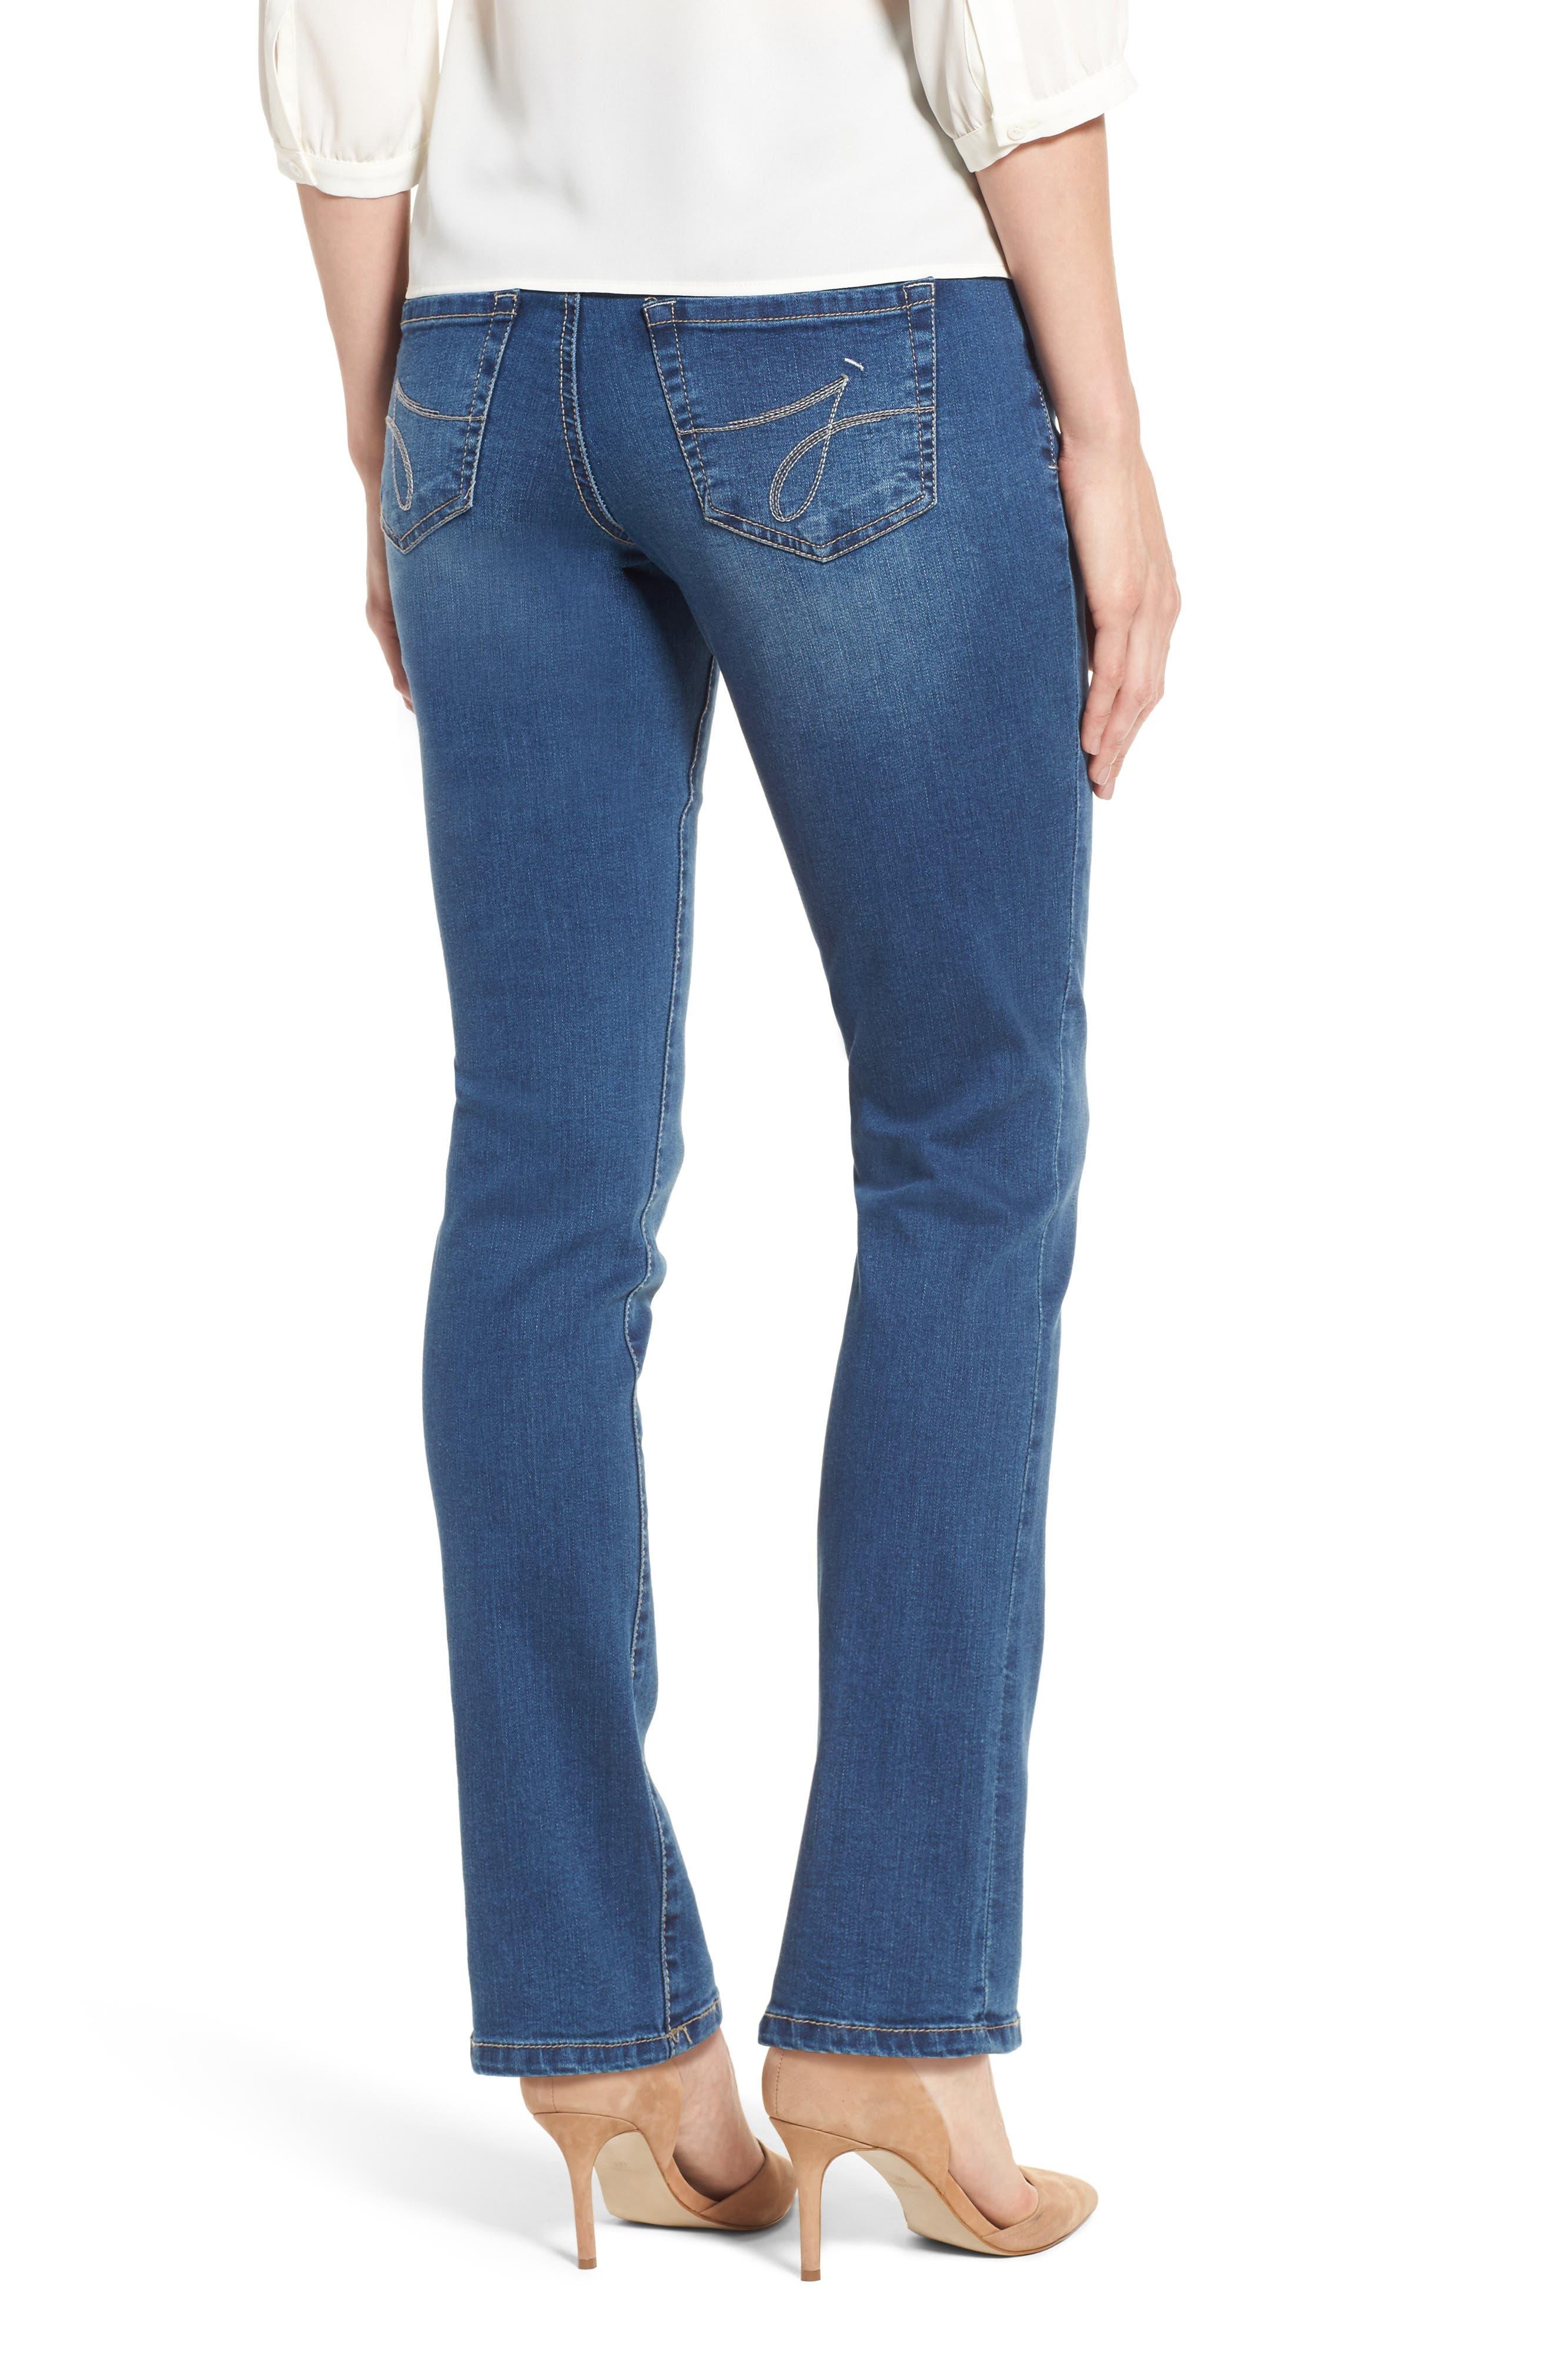 Peri Pull-On Straight Leg Jeans,                             Alternate thumbnail 2, color,                             Medium Indigo